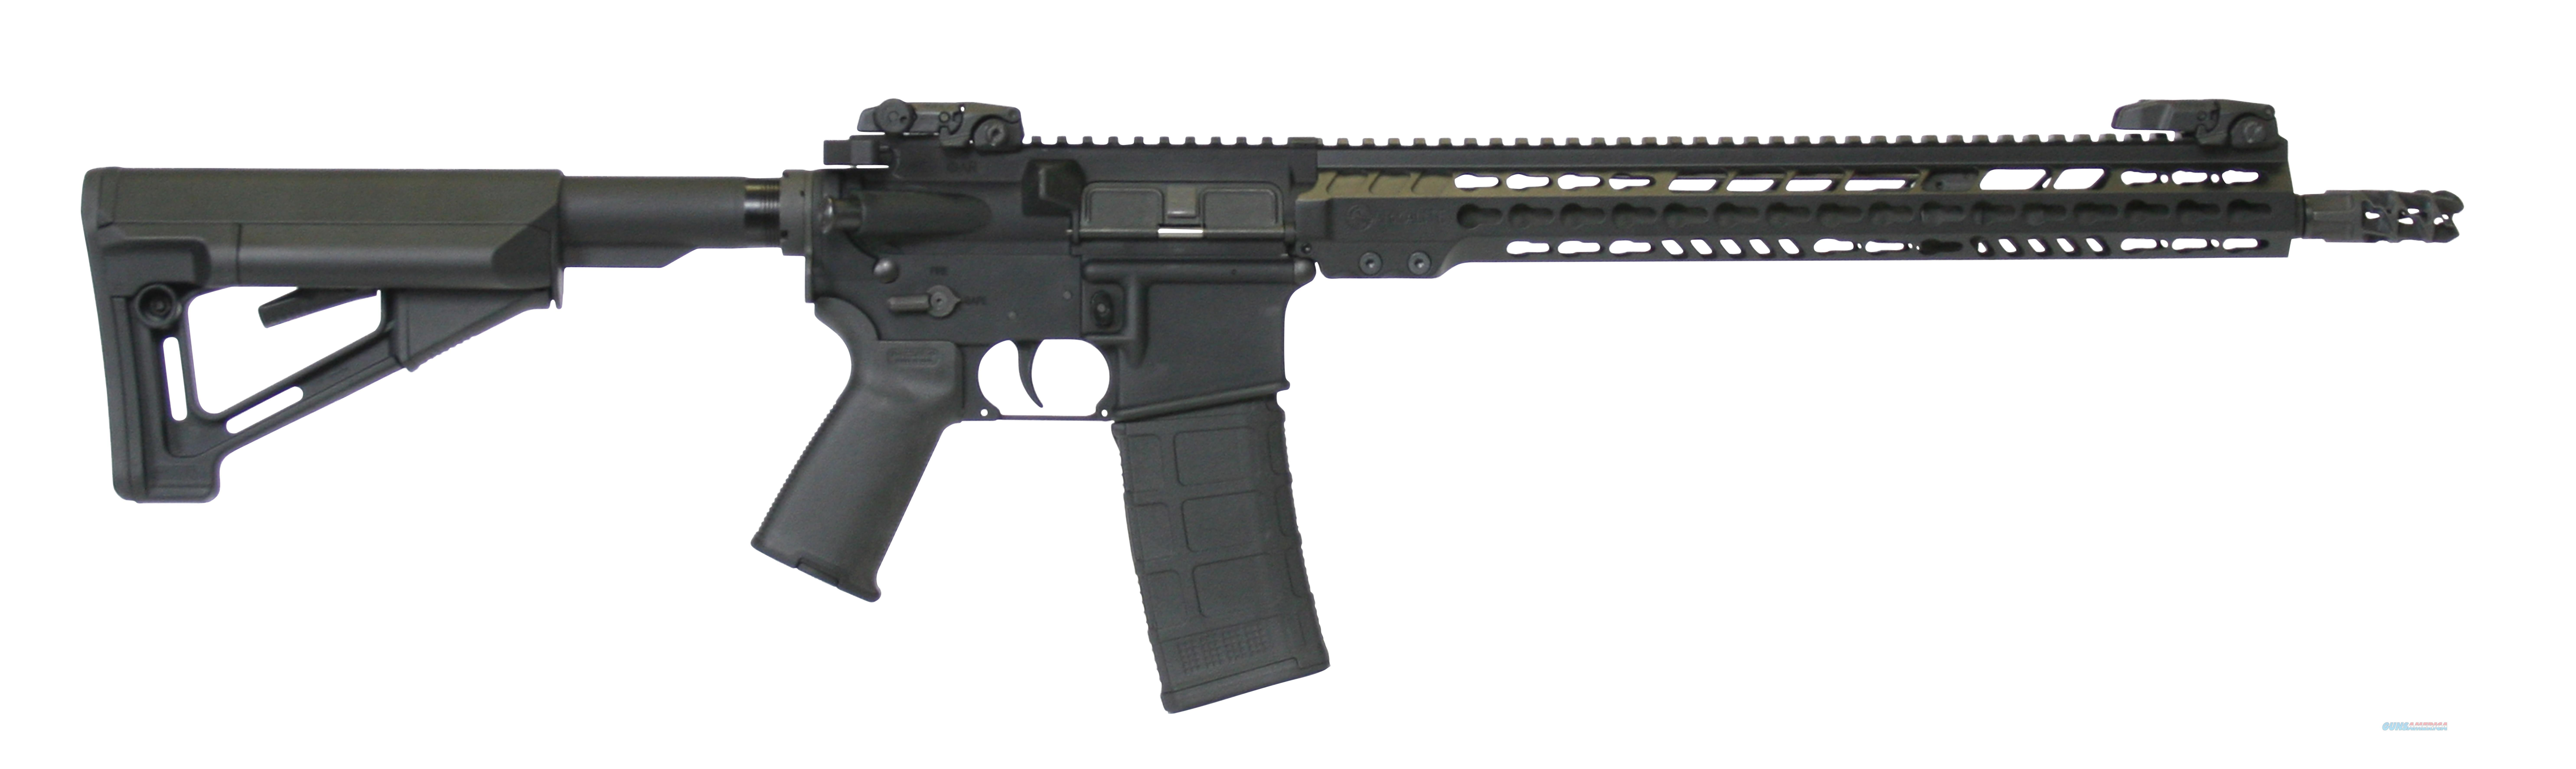 "Armalite M15tac16 M-15 Tactical Rifle Semi-Automatic 223 Remington/5.56 Nato 16"" Fh 30+1 Mbus Magpul Str Black Stk Black Hard Coat Anodized/Phosphate M15TAC16  Guns > Rifles > A Misc Rifles"